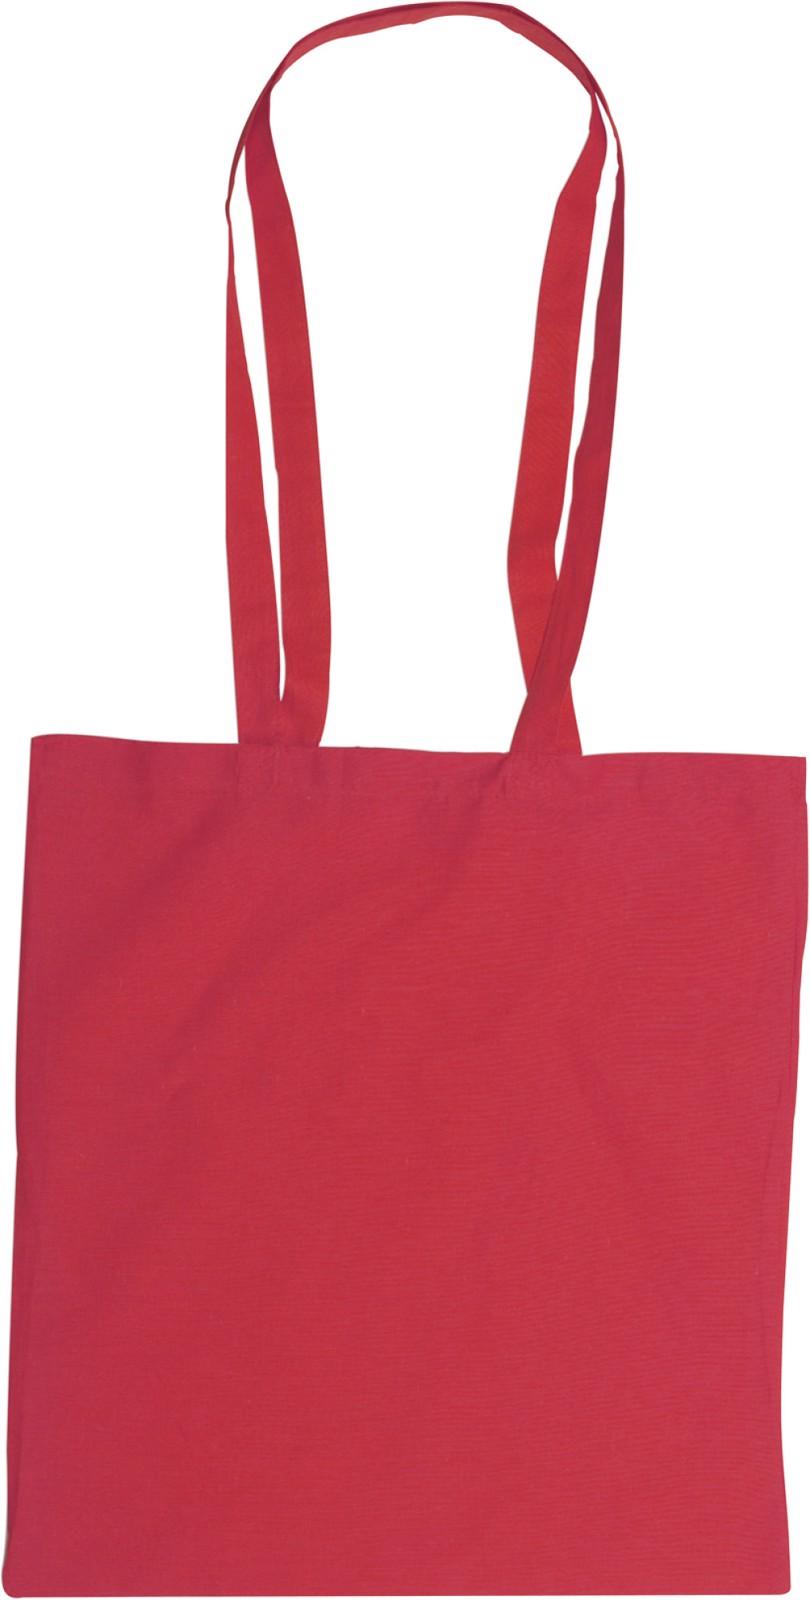 Cotton (110 gr/m²) bag - Red